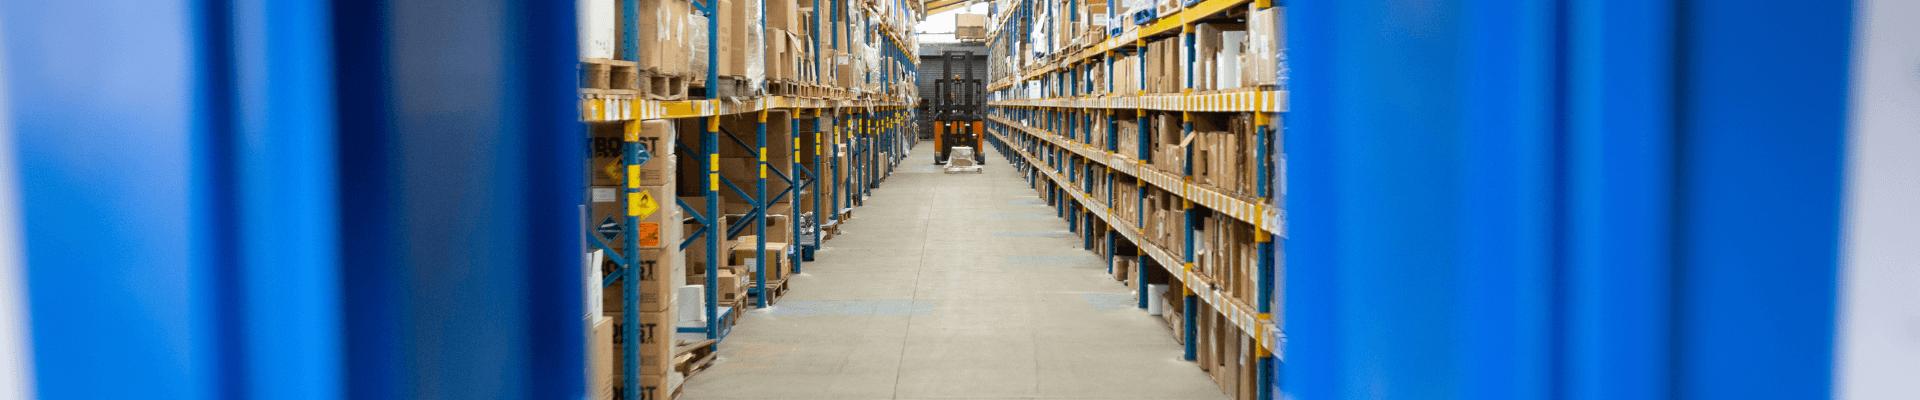 3pl warehouse, 3pl fulfilment centre, fulfilment centre uk, fulfilment centre Nuneaton, fulfilment warehouse near me,